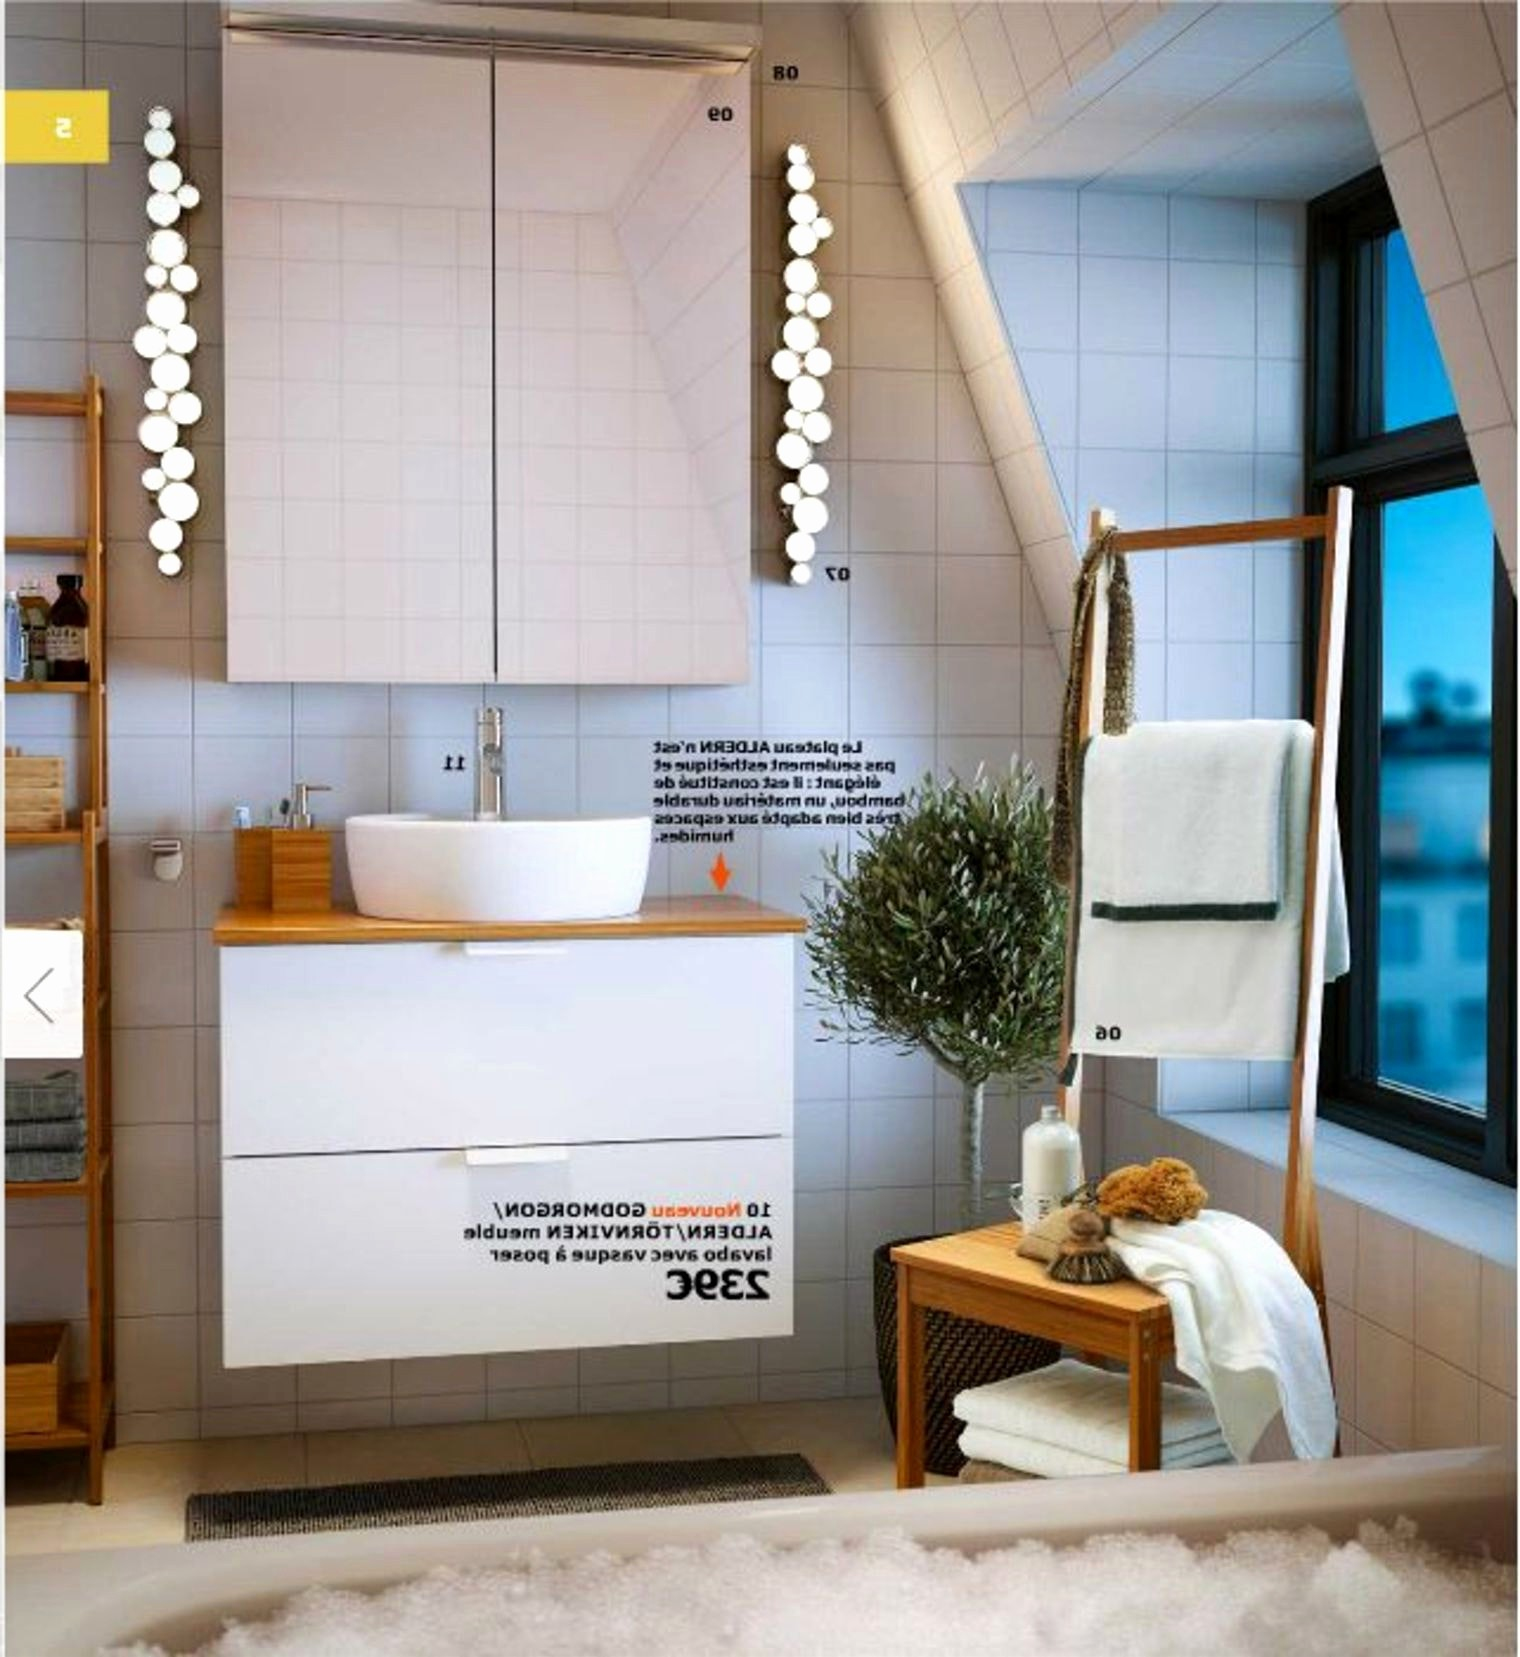 Ikea Salles De Bains Frais Collection Ikea Etagere Salle De Bain Best Armoire Salle De Bain Ikea Beau